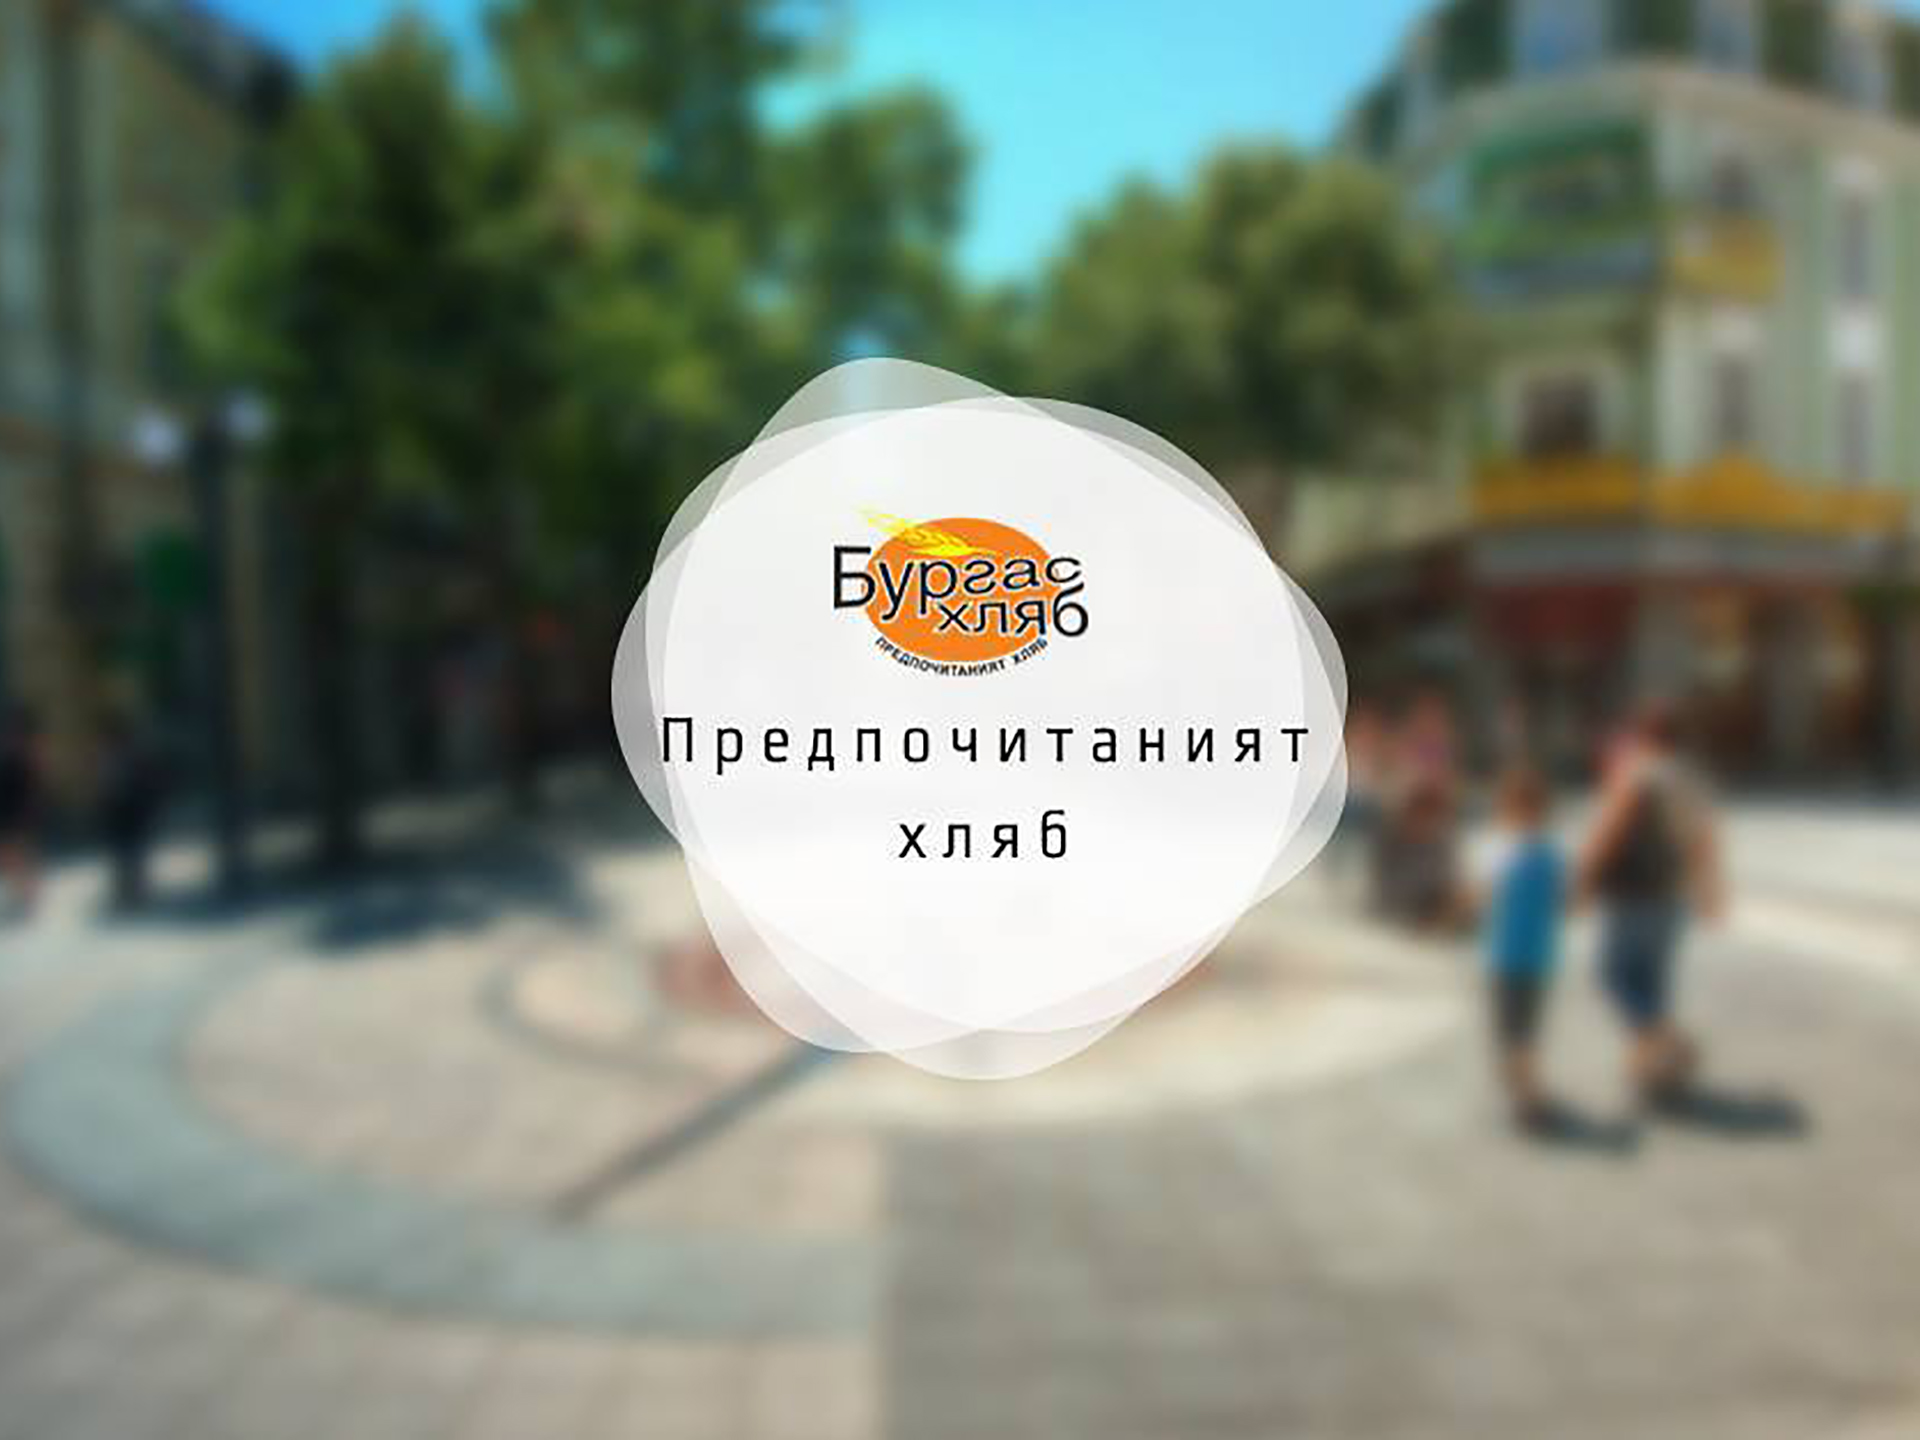 Графична обработка на банери за Бургас Хляб